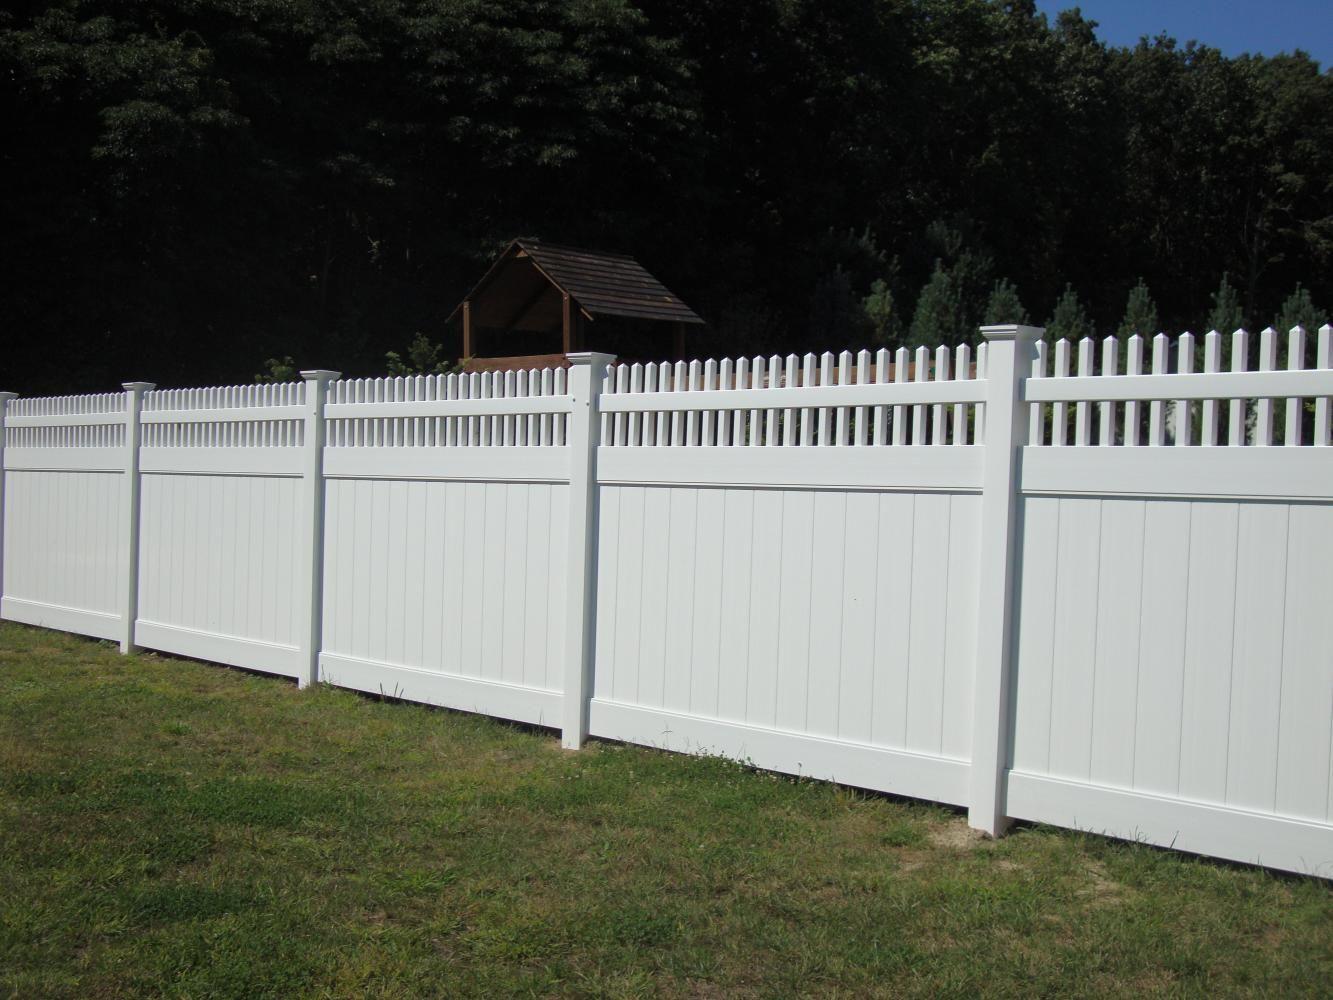 Vinyl Fence Post Caps Optional Choice Decorative Fence Post Caps Outdoor Decor Decor